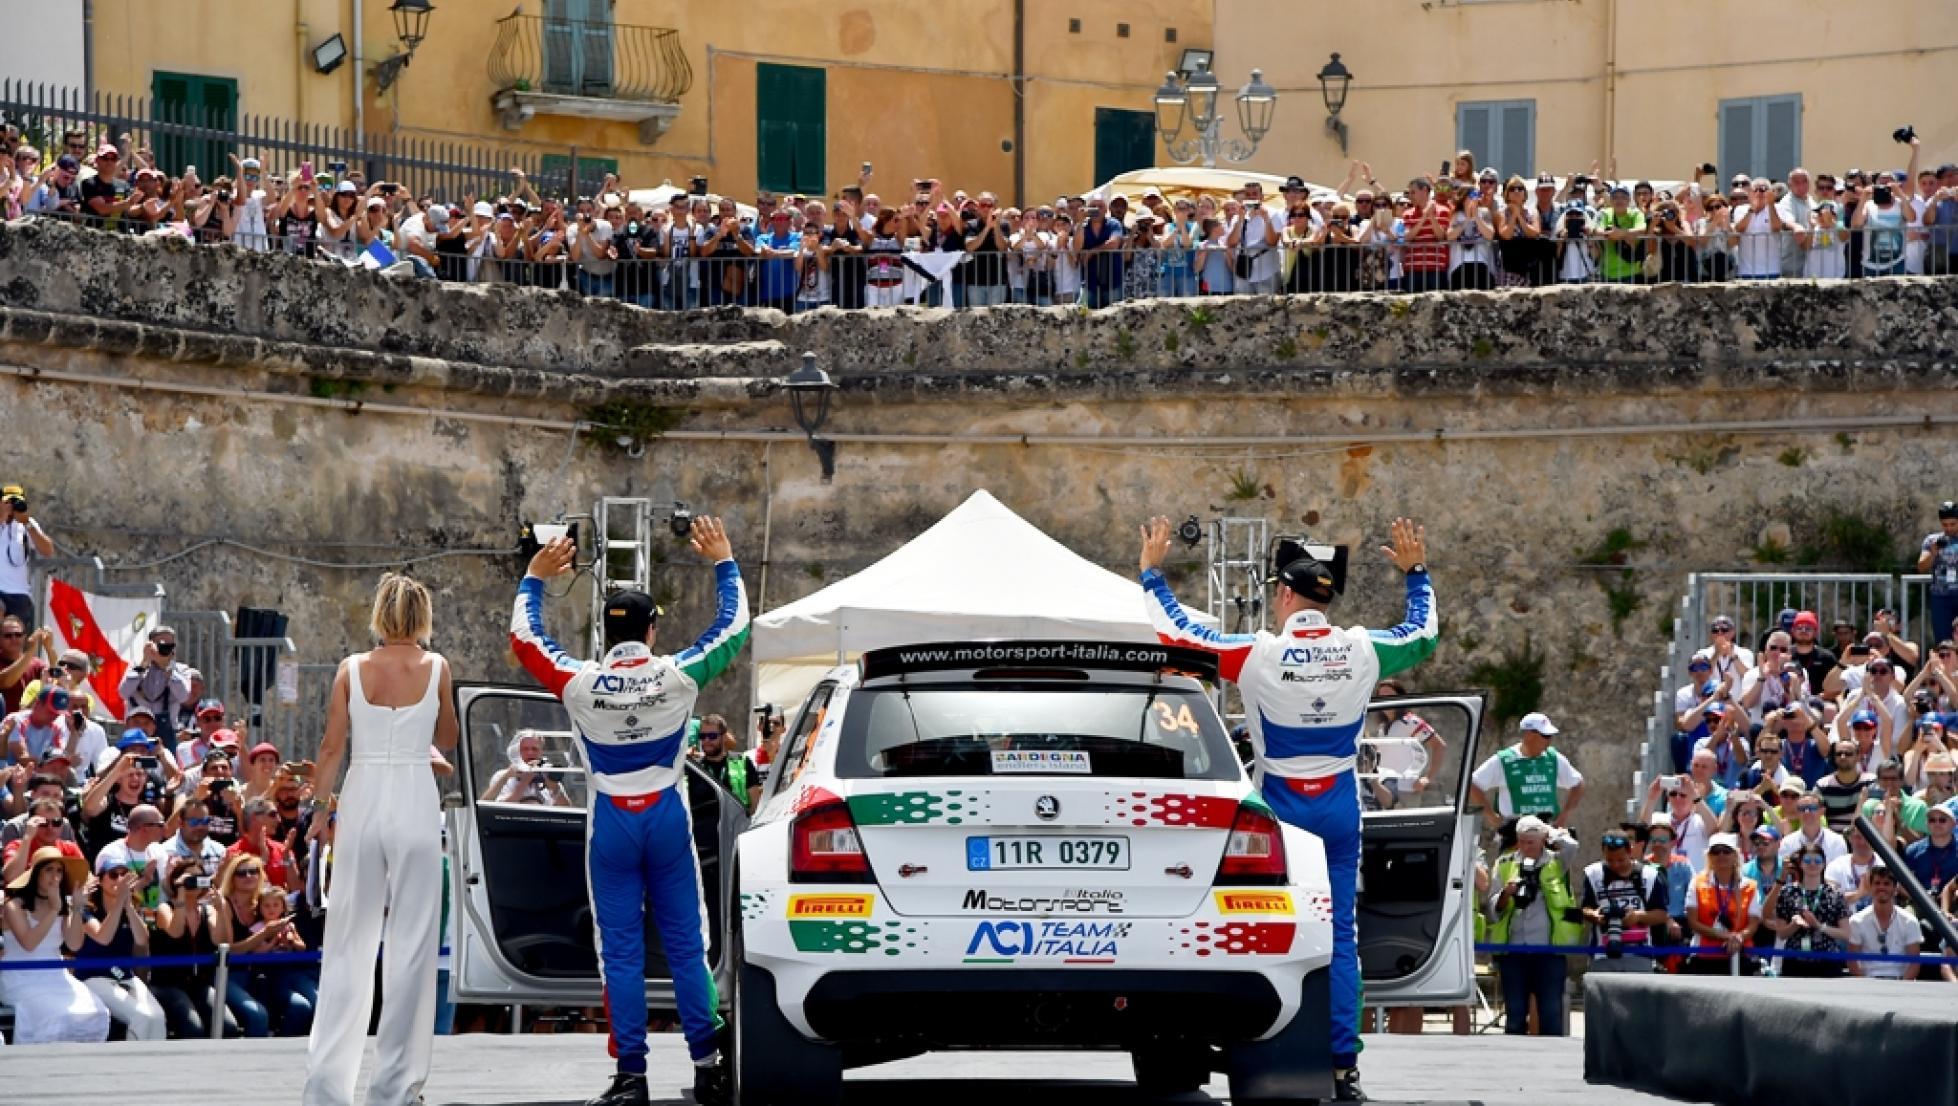 Alghero, Rally Italia Sardegna 2018